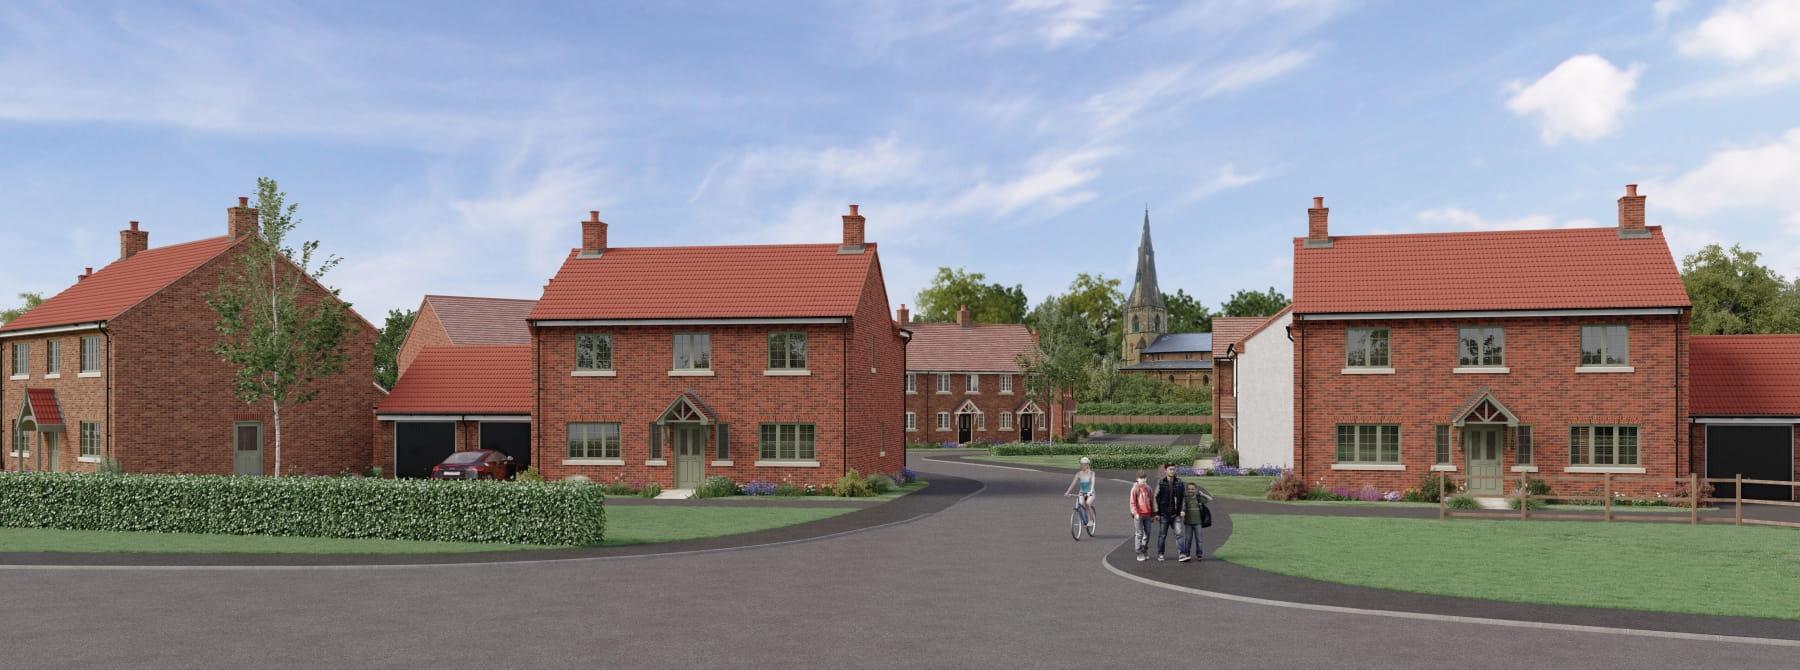 Finest New Homes At Regency Gardens With Regency Gardens